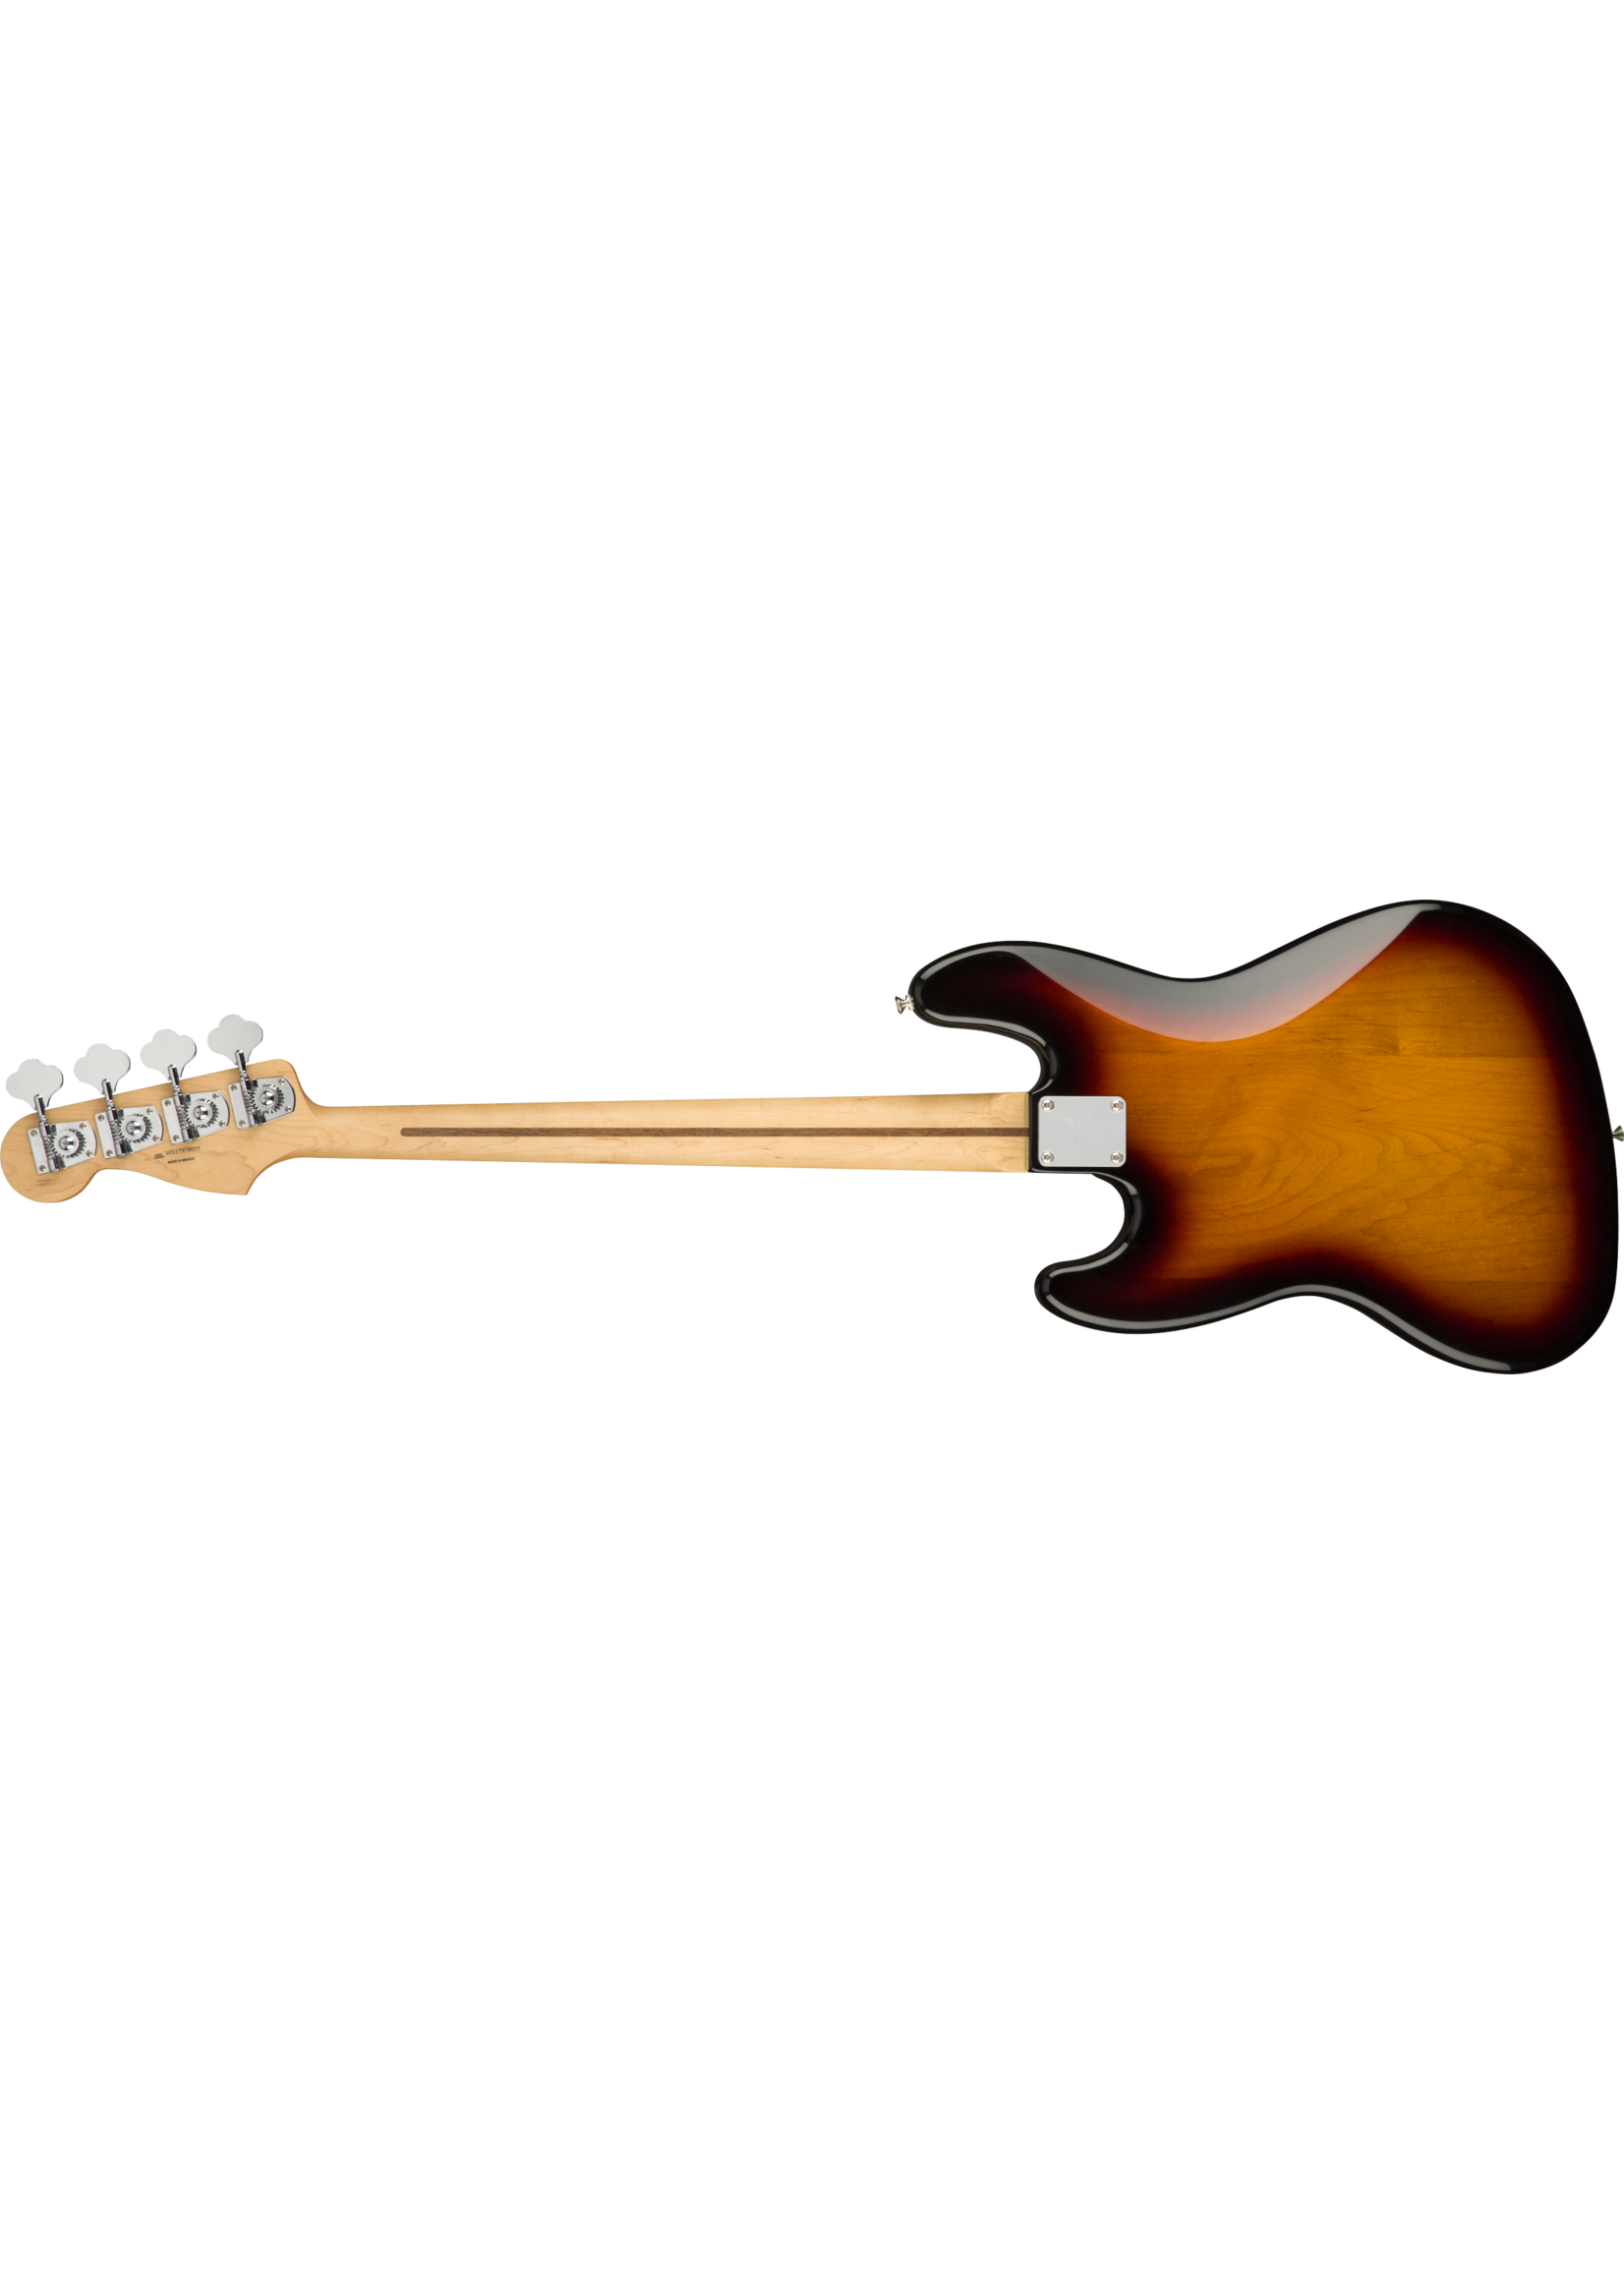 Fender Fender Player Jazz Bass Fretless with Pau Ferro Fretboard 3-Color Sunburst